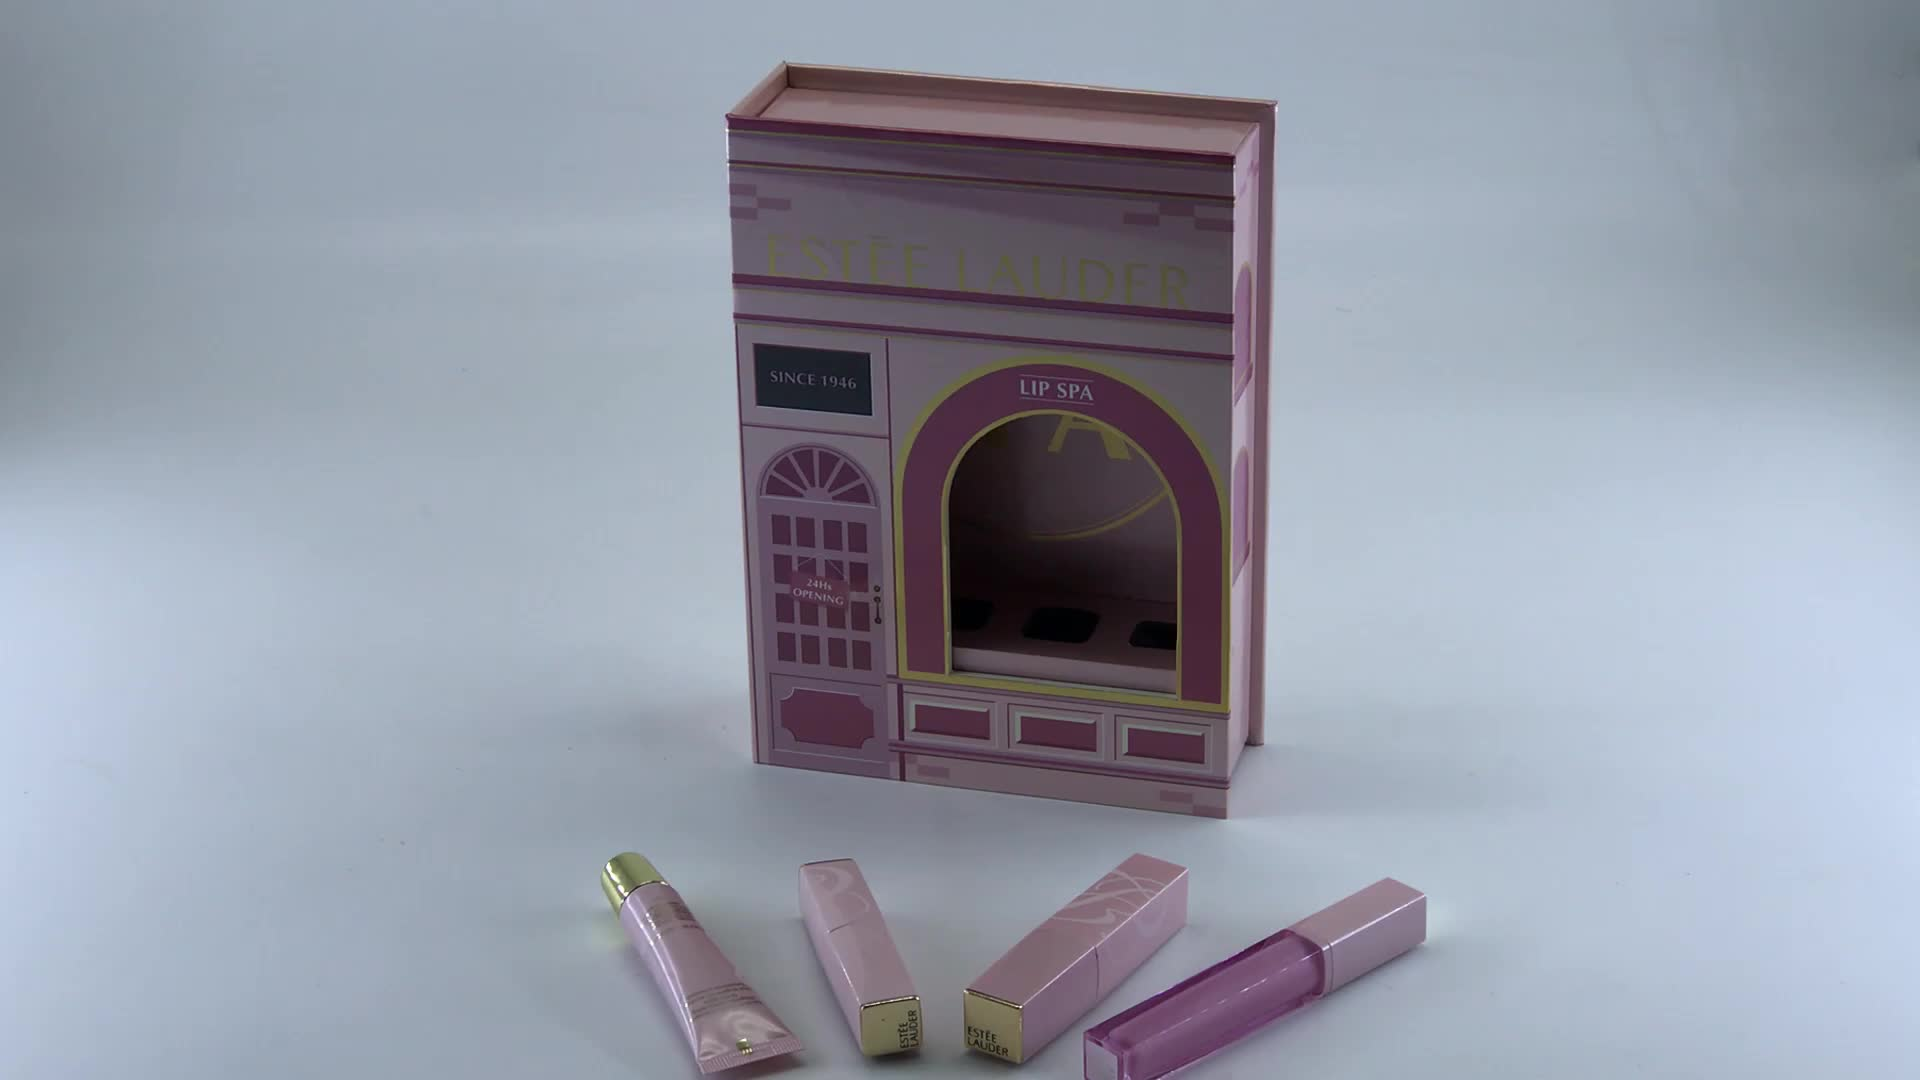 china custom luxury pink door cardboard box with spa 4 pcs moisturizing  lip color for lipstick cosmetics perfume box packaging